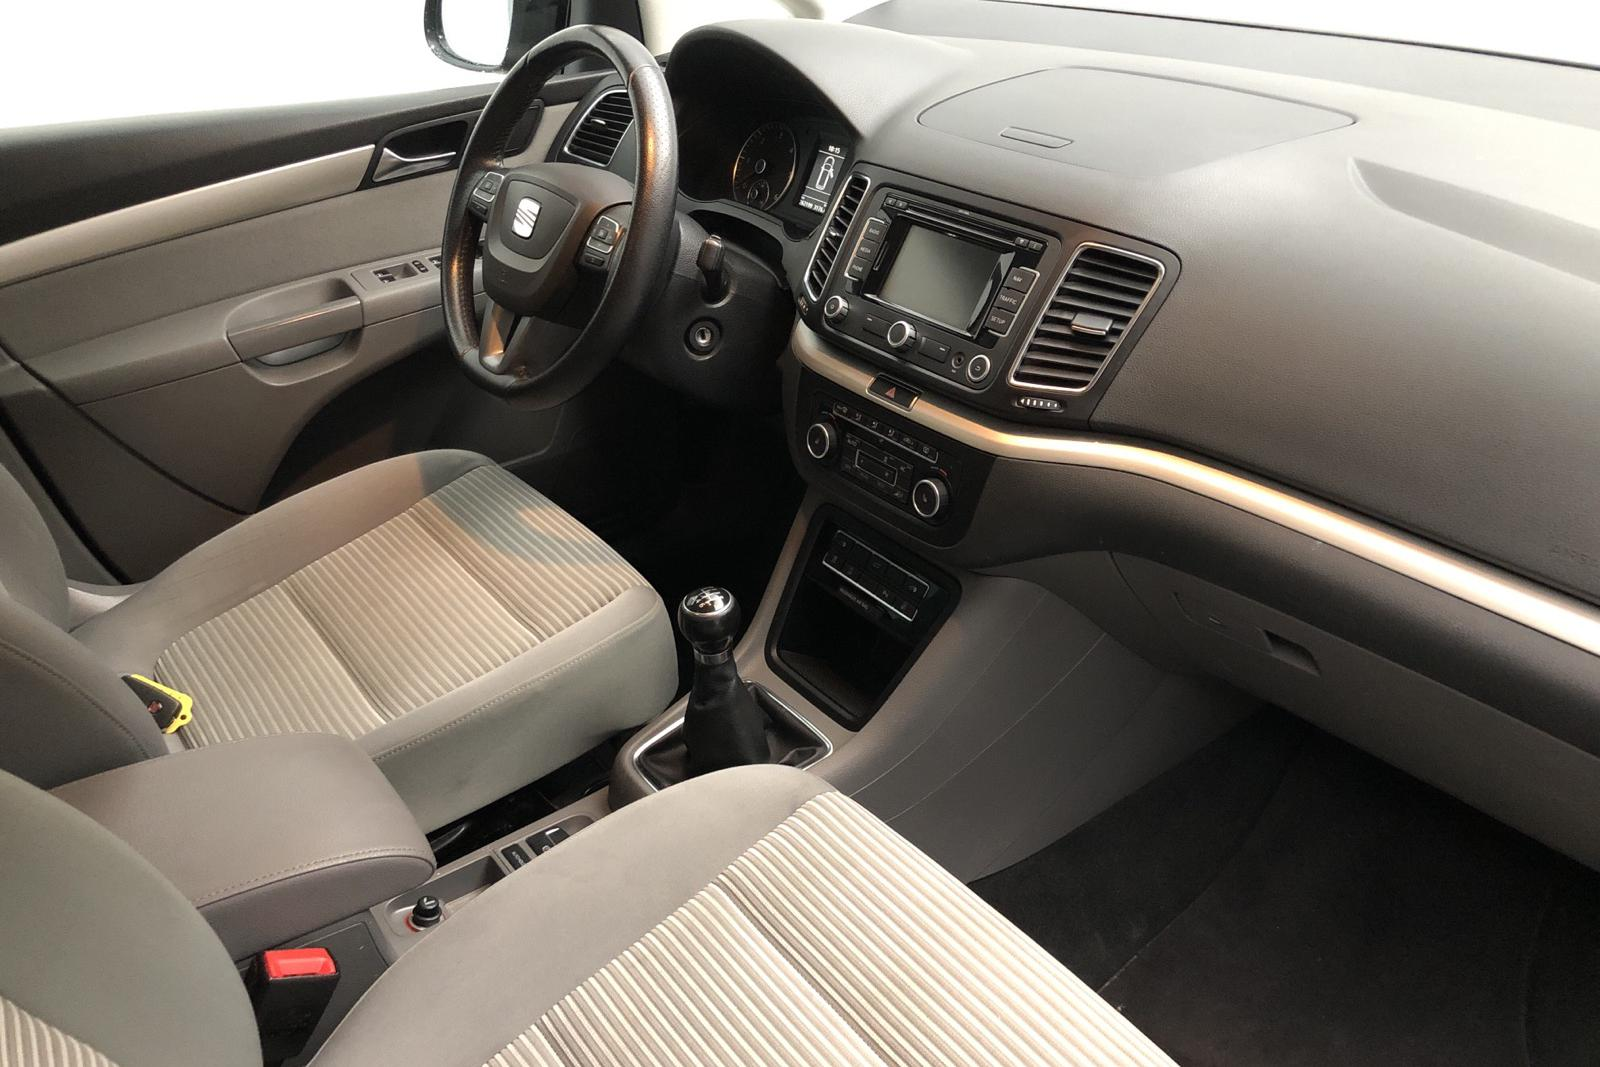 Seat Alhambra 2.0 CR (170hk) - 26 219 mil - Manuell - svart - 2011